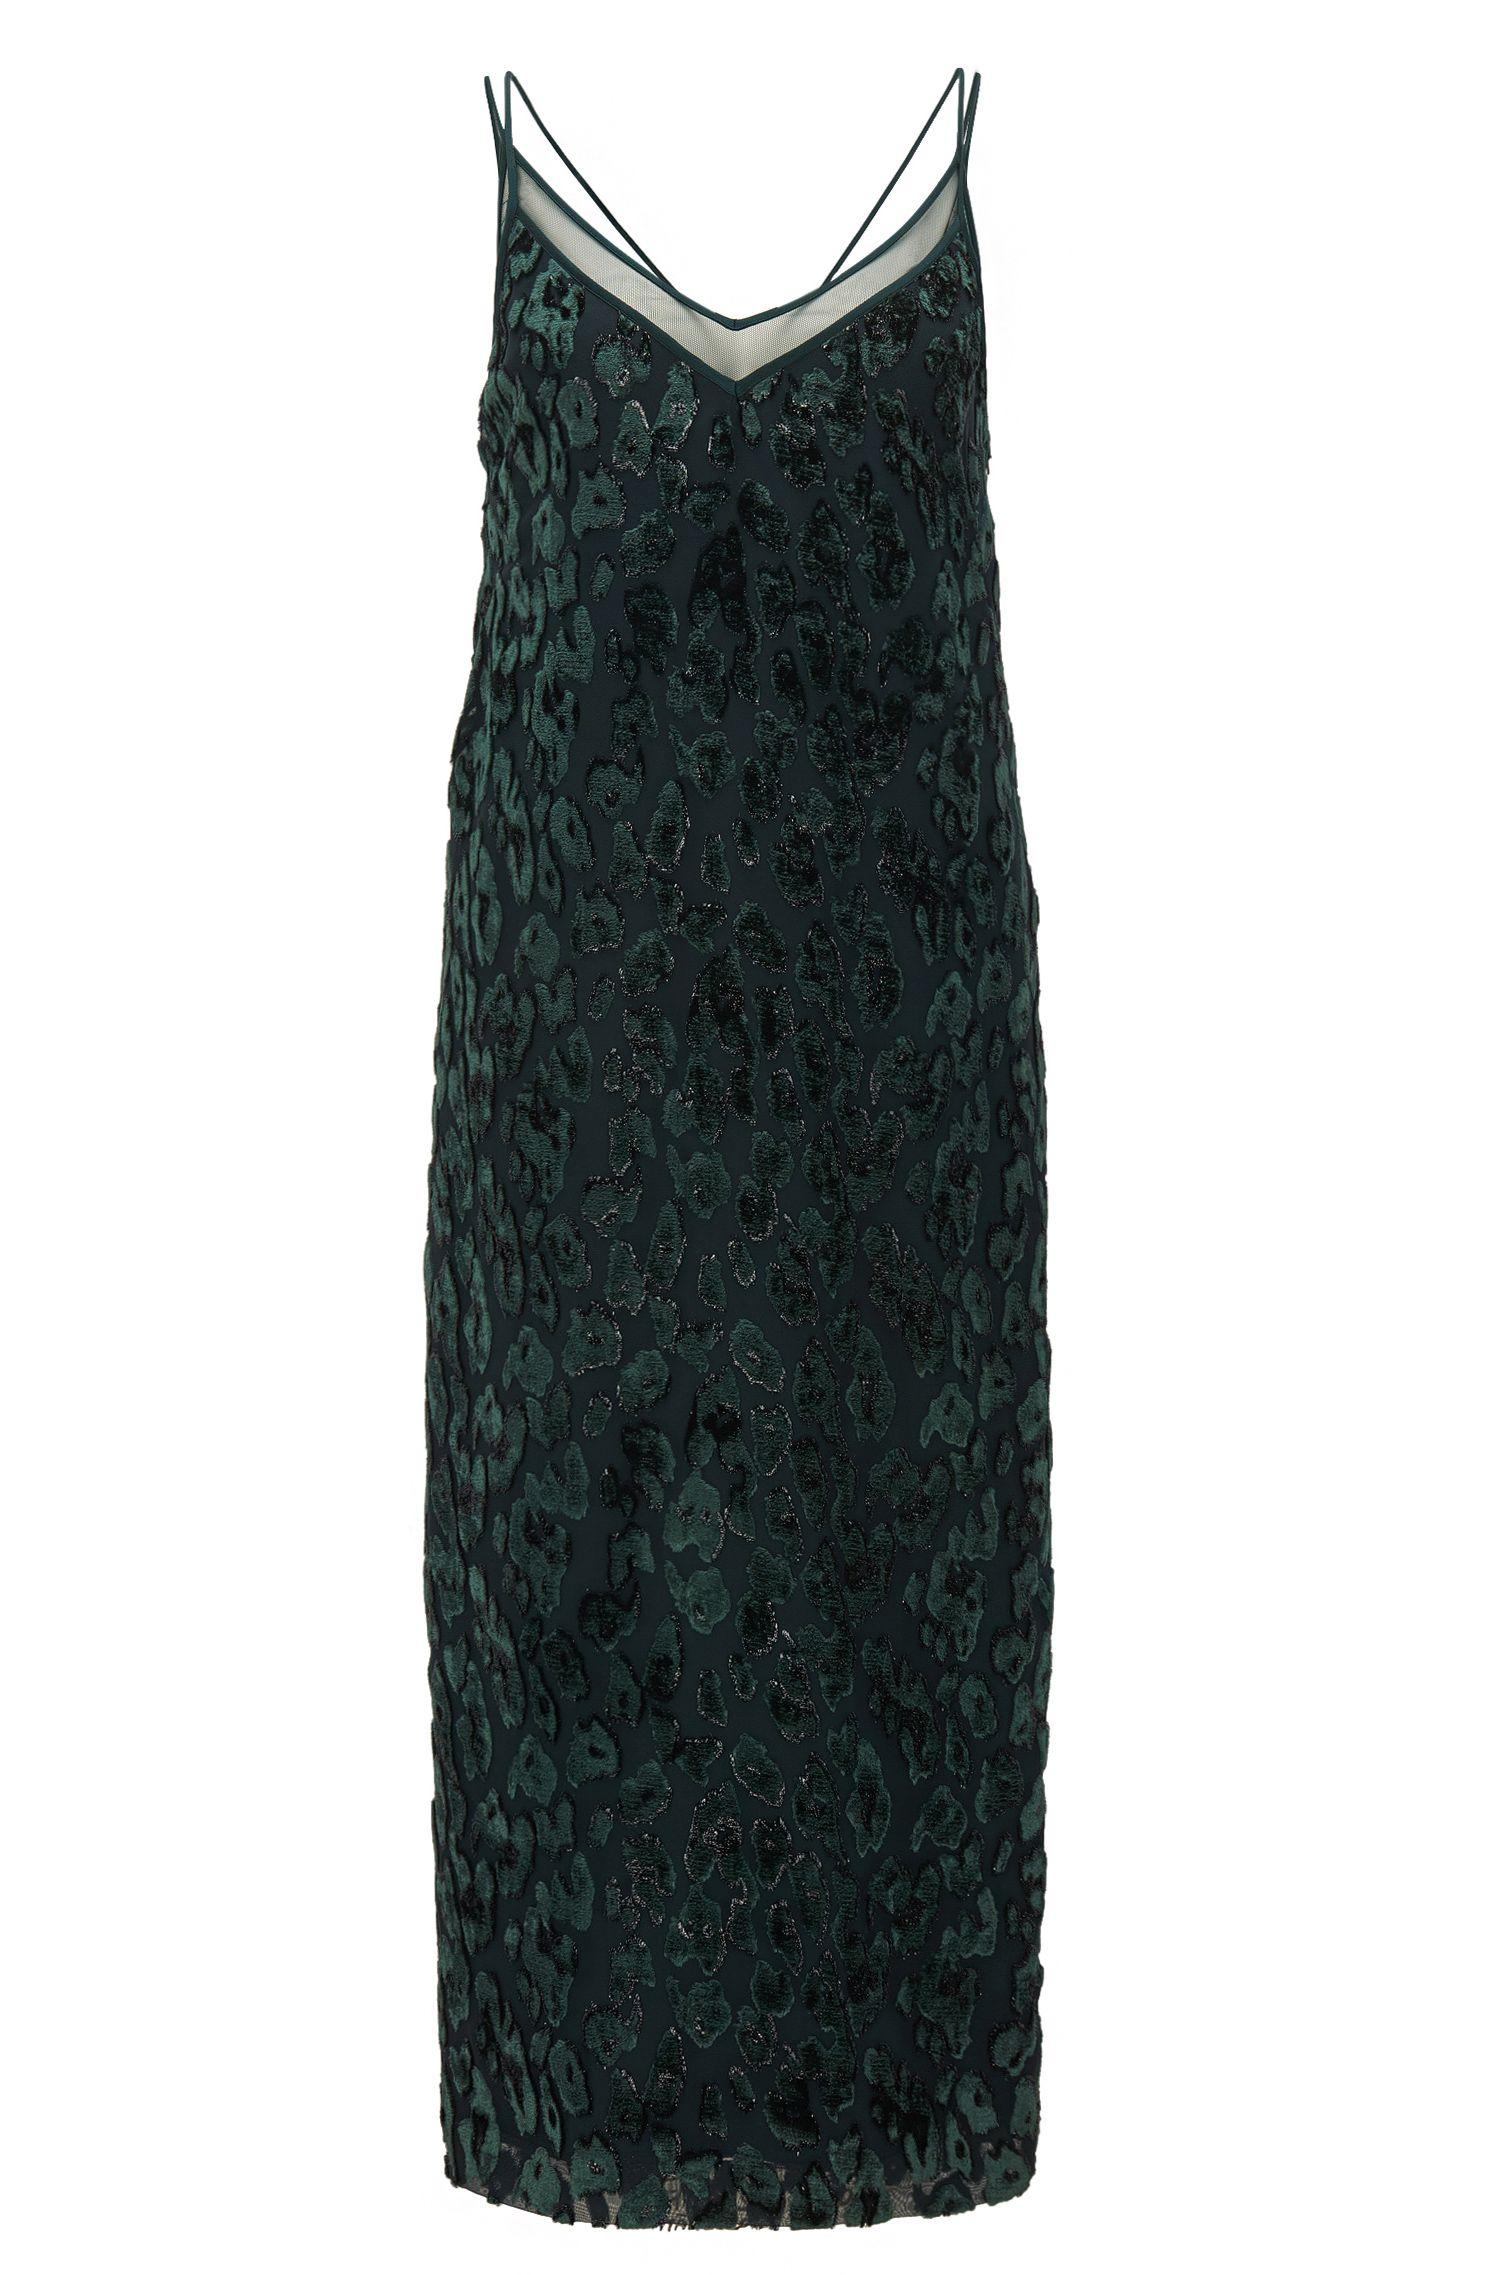 Gemustertes Cocktailkleid aus Material-Mix mit transparentem V-Ausschnitt